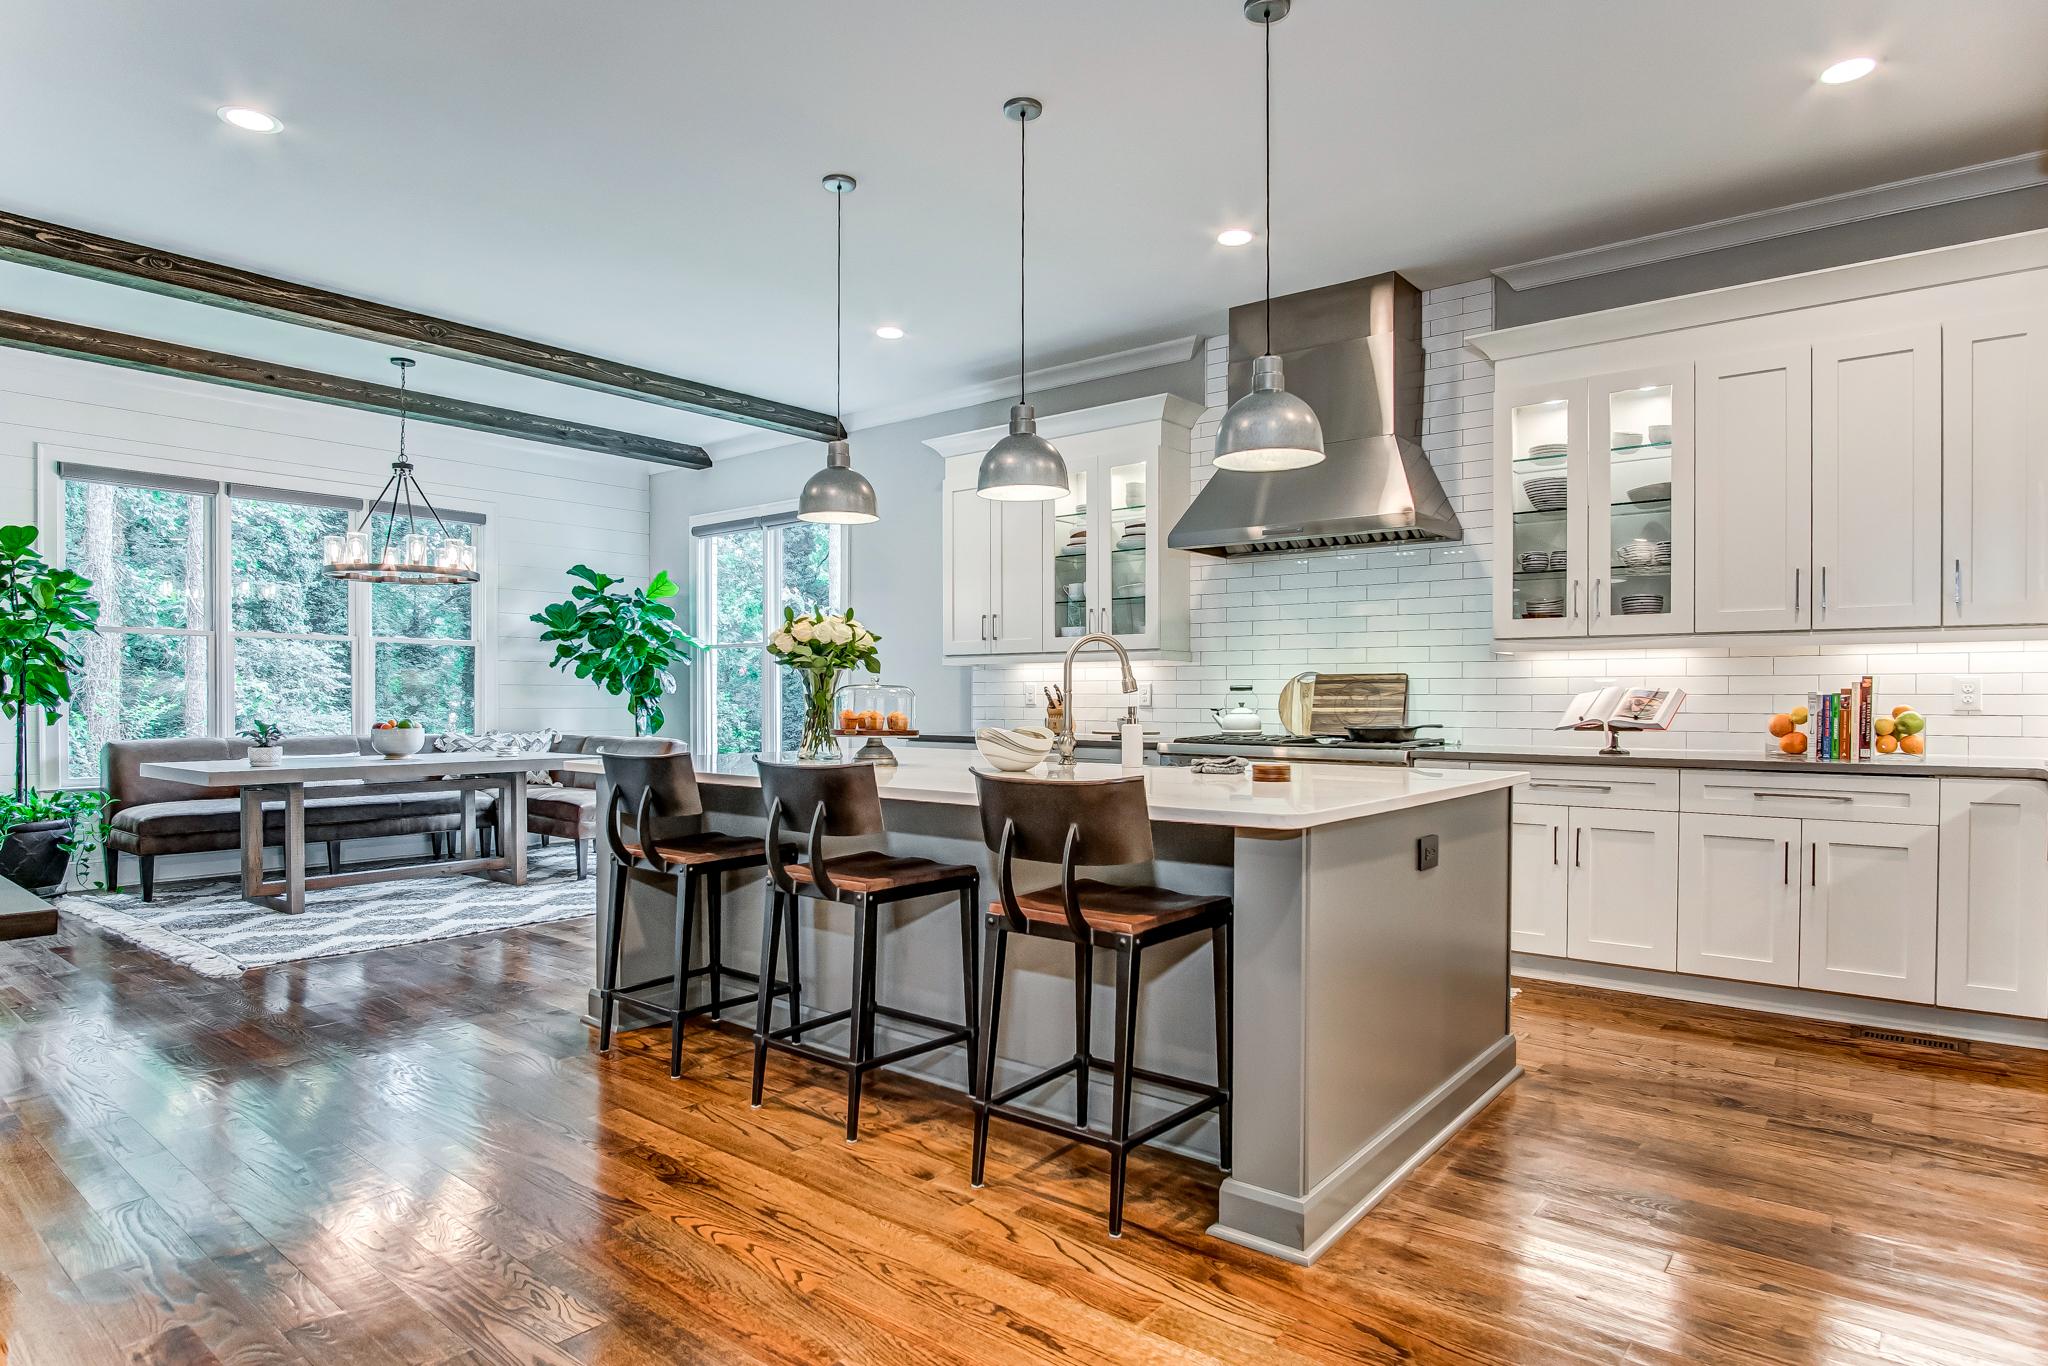 Gorgeous Atlanta, Georgia kitchen photographed by Cherokee Drone Services